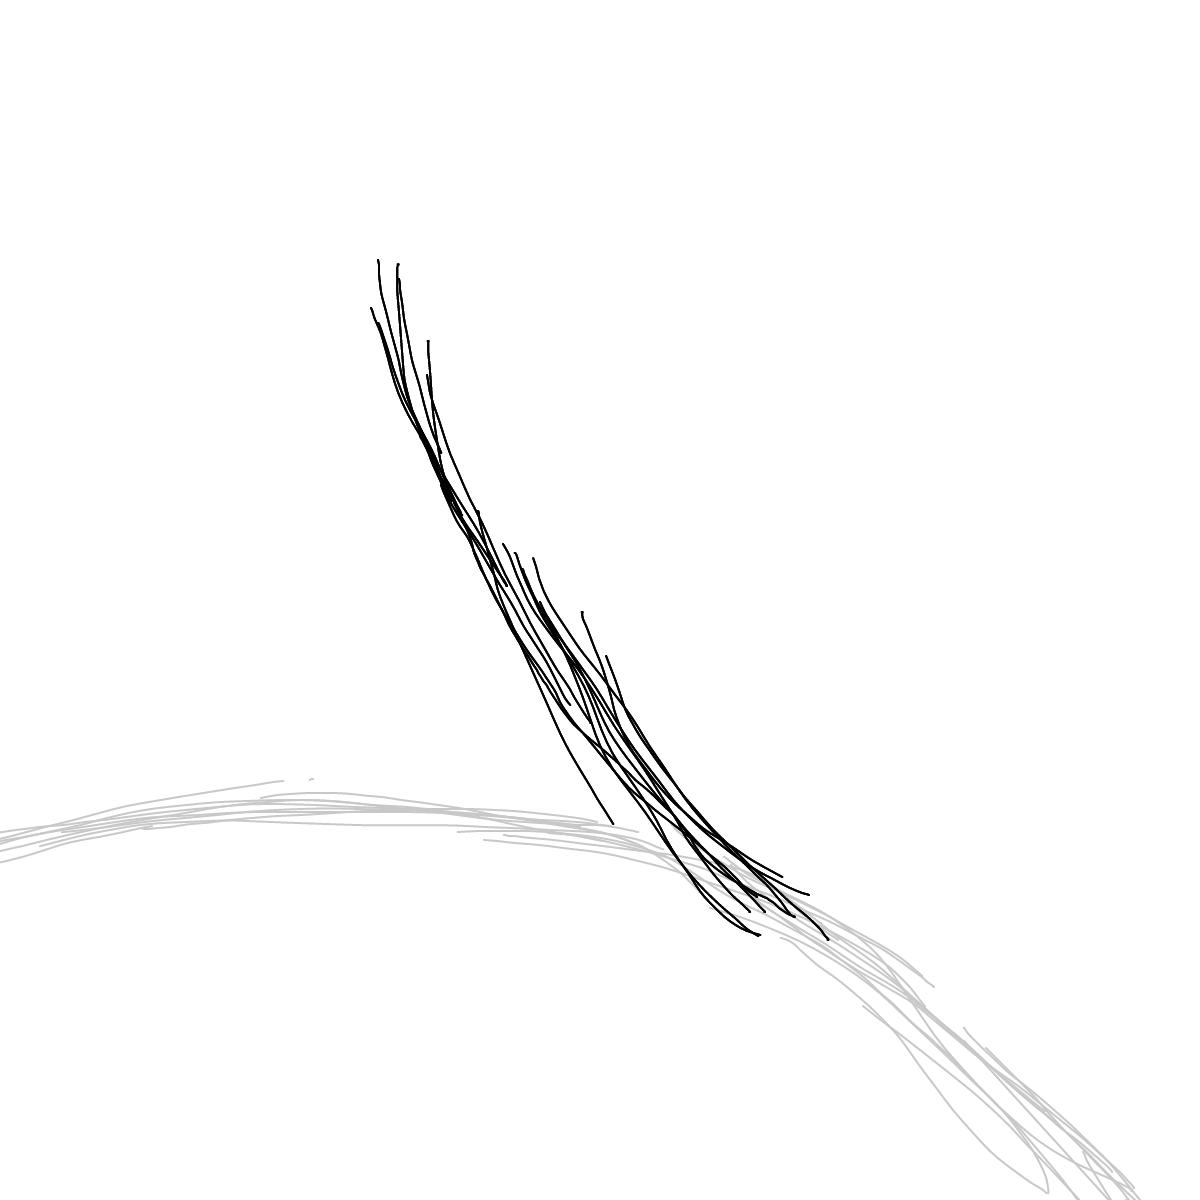 BAAAM drawing#18928 lat:-23.5476284027099600lng: -46.6355743408203100